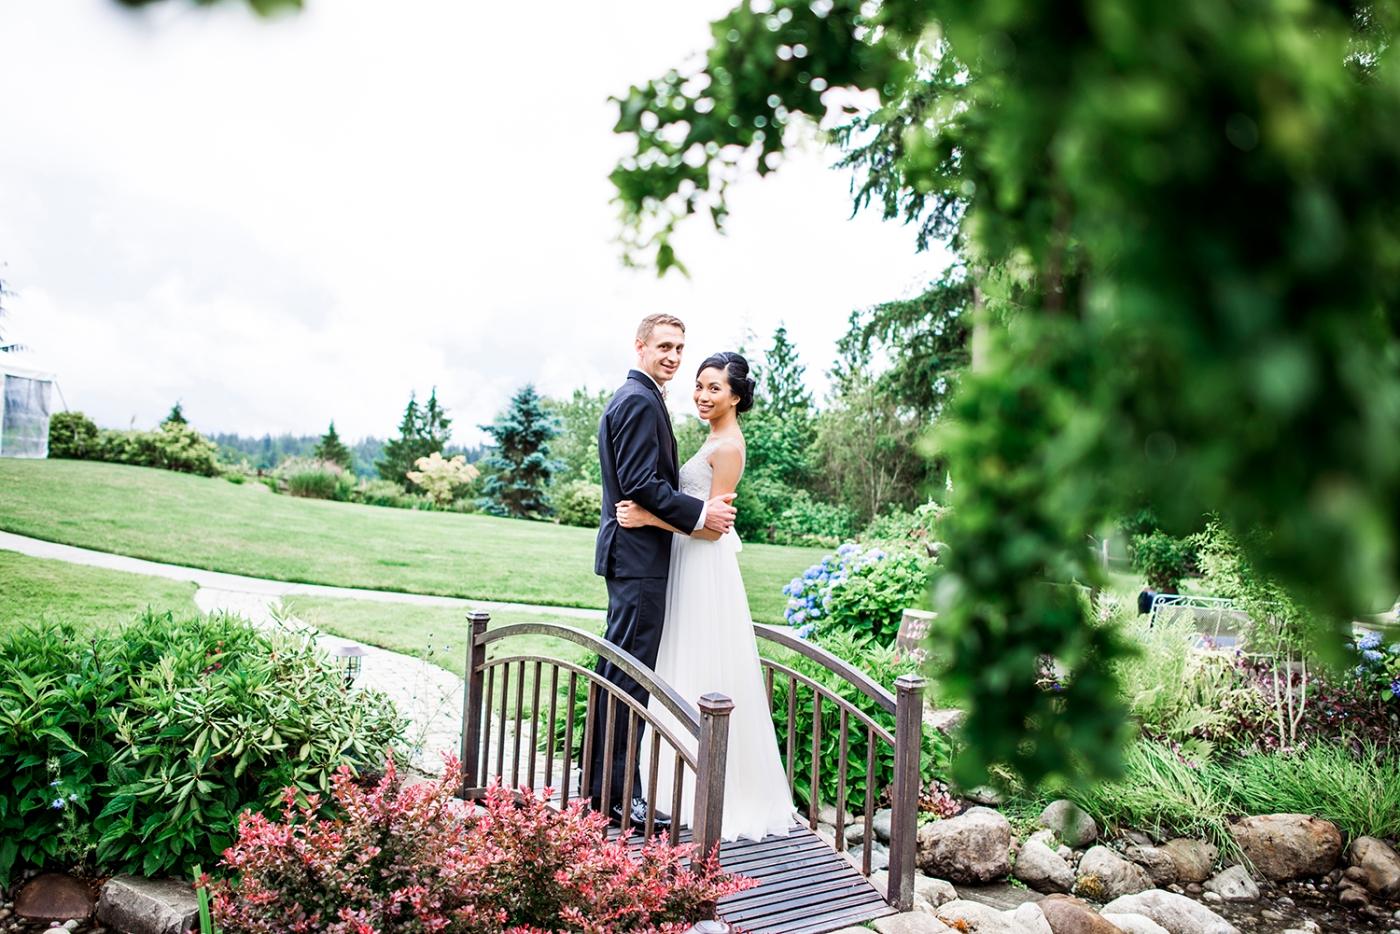 Jane_Speleers_2016_arriving to reception _Wedding_Wild_Rose_Estates_VenueDSC_9836